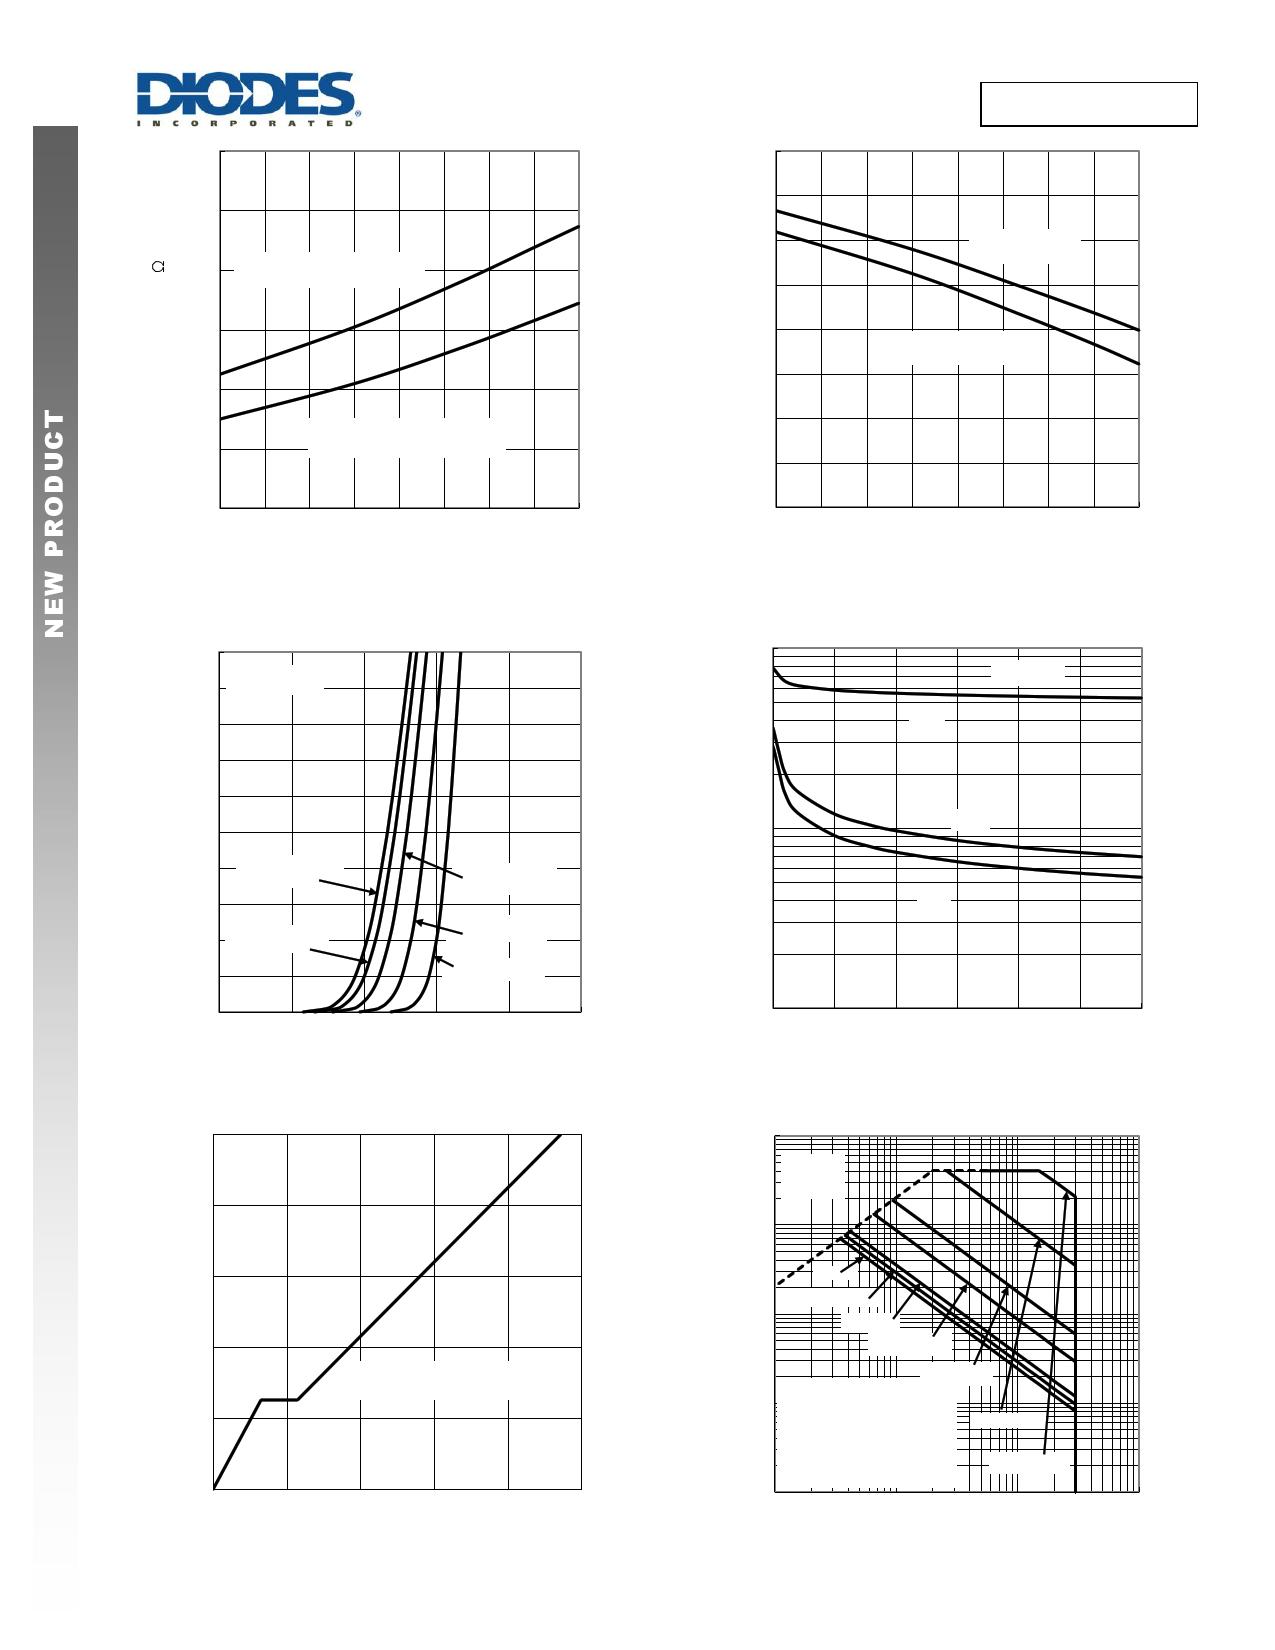 DMC3400SDW pdf